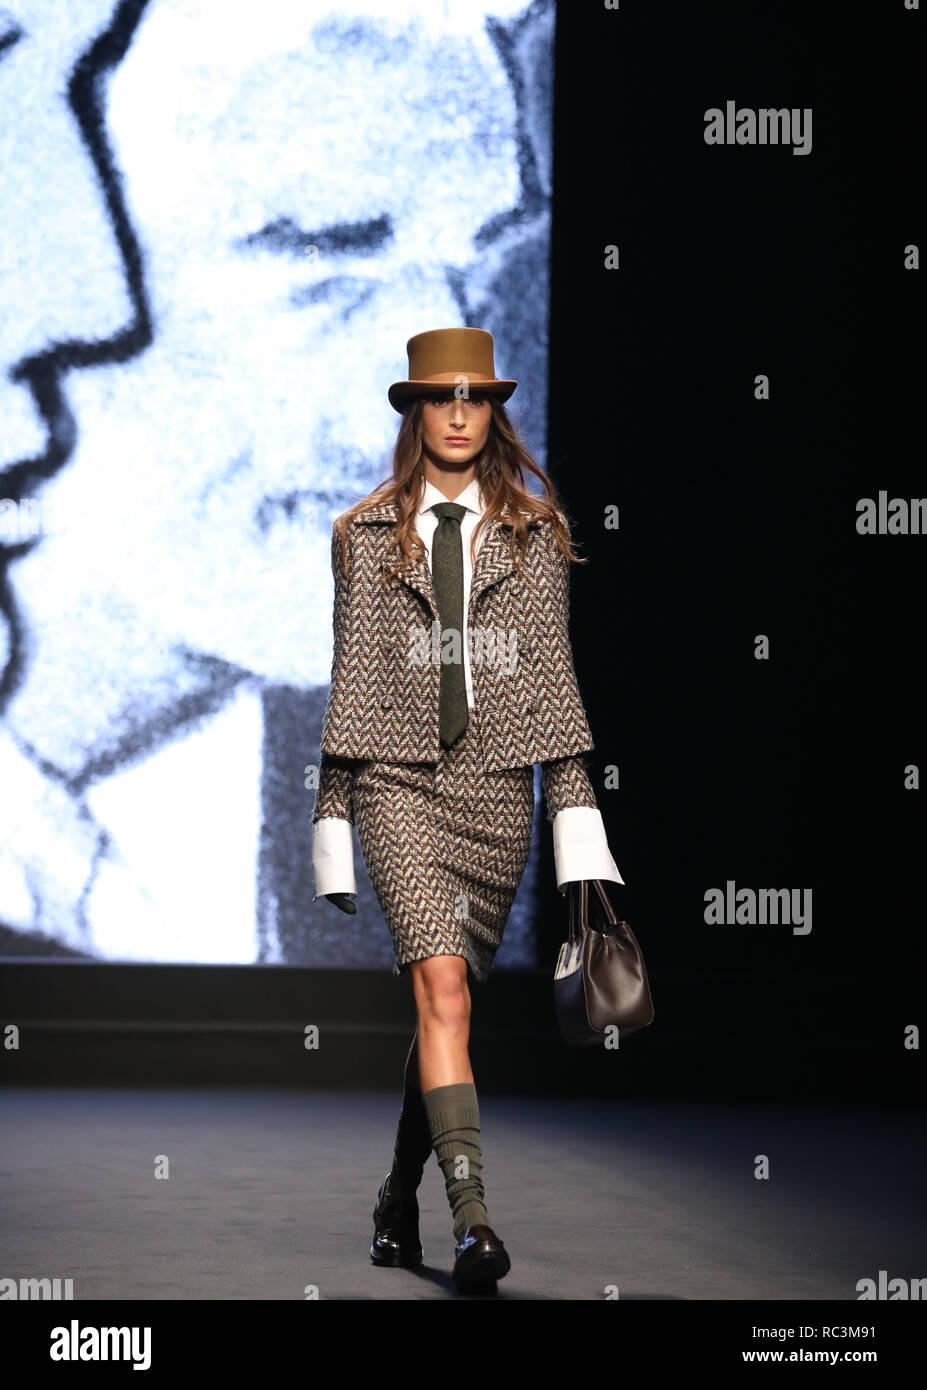 19481590ae9e 13, 2019 (Xinhua) - (190113) -- MILAN, Jan. 13, 2019 (Xinhua) -- A model  presents a creation for DAKS during Milan Men's Fashion Week Fall/Winter ...